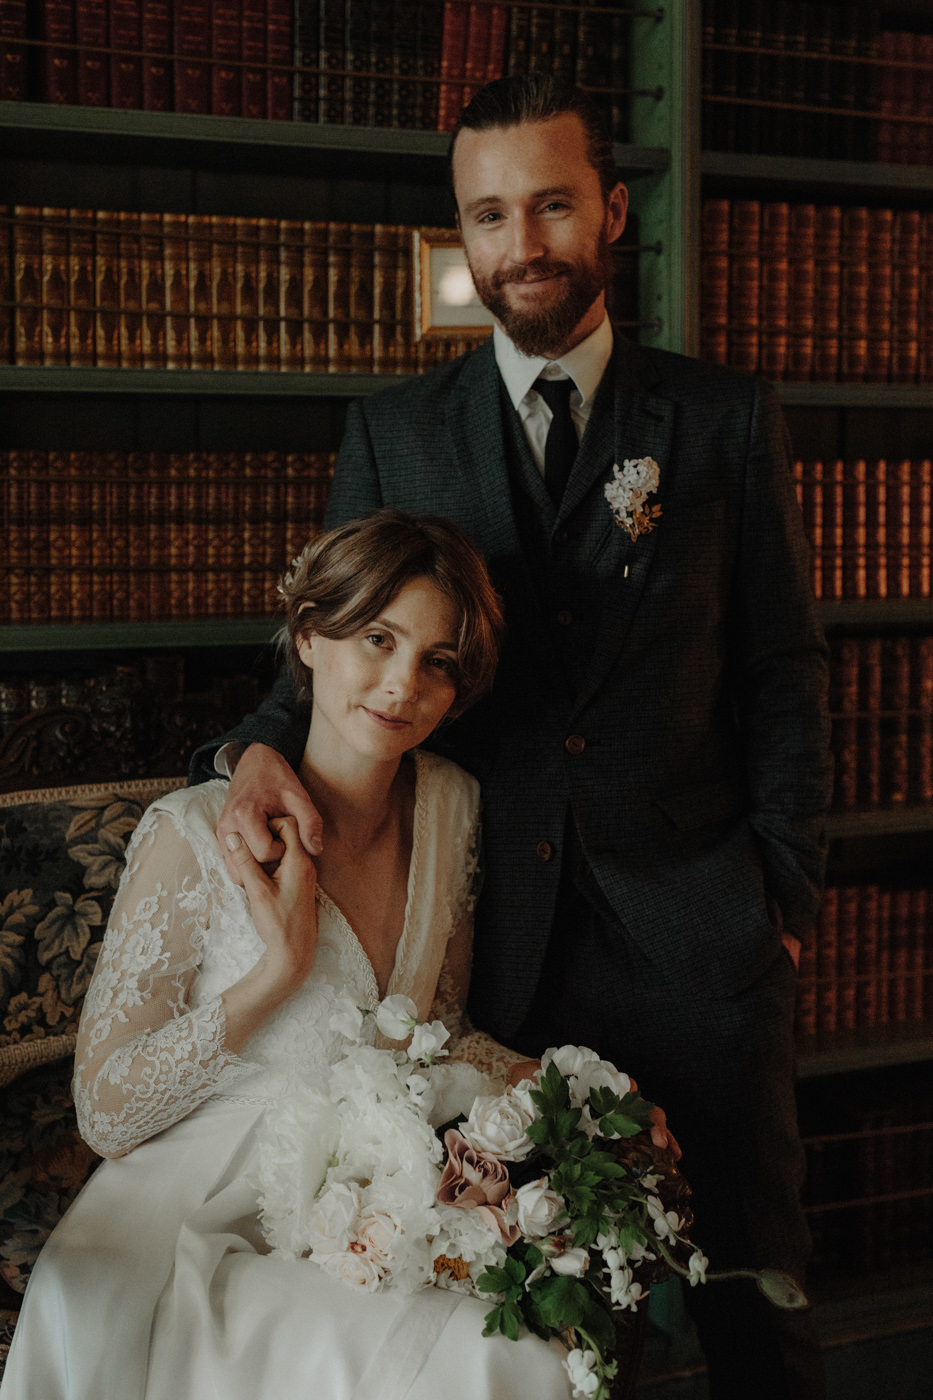 Erin-Mike-Intimate-Vintage-Wedding-Shelburne-Farms-Vermont -142.jpg